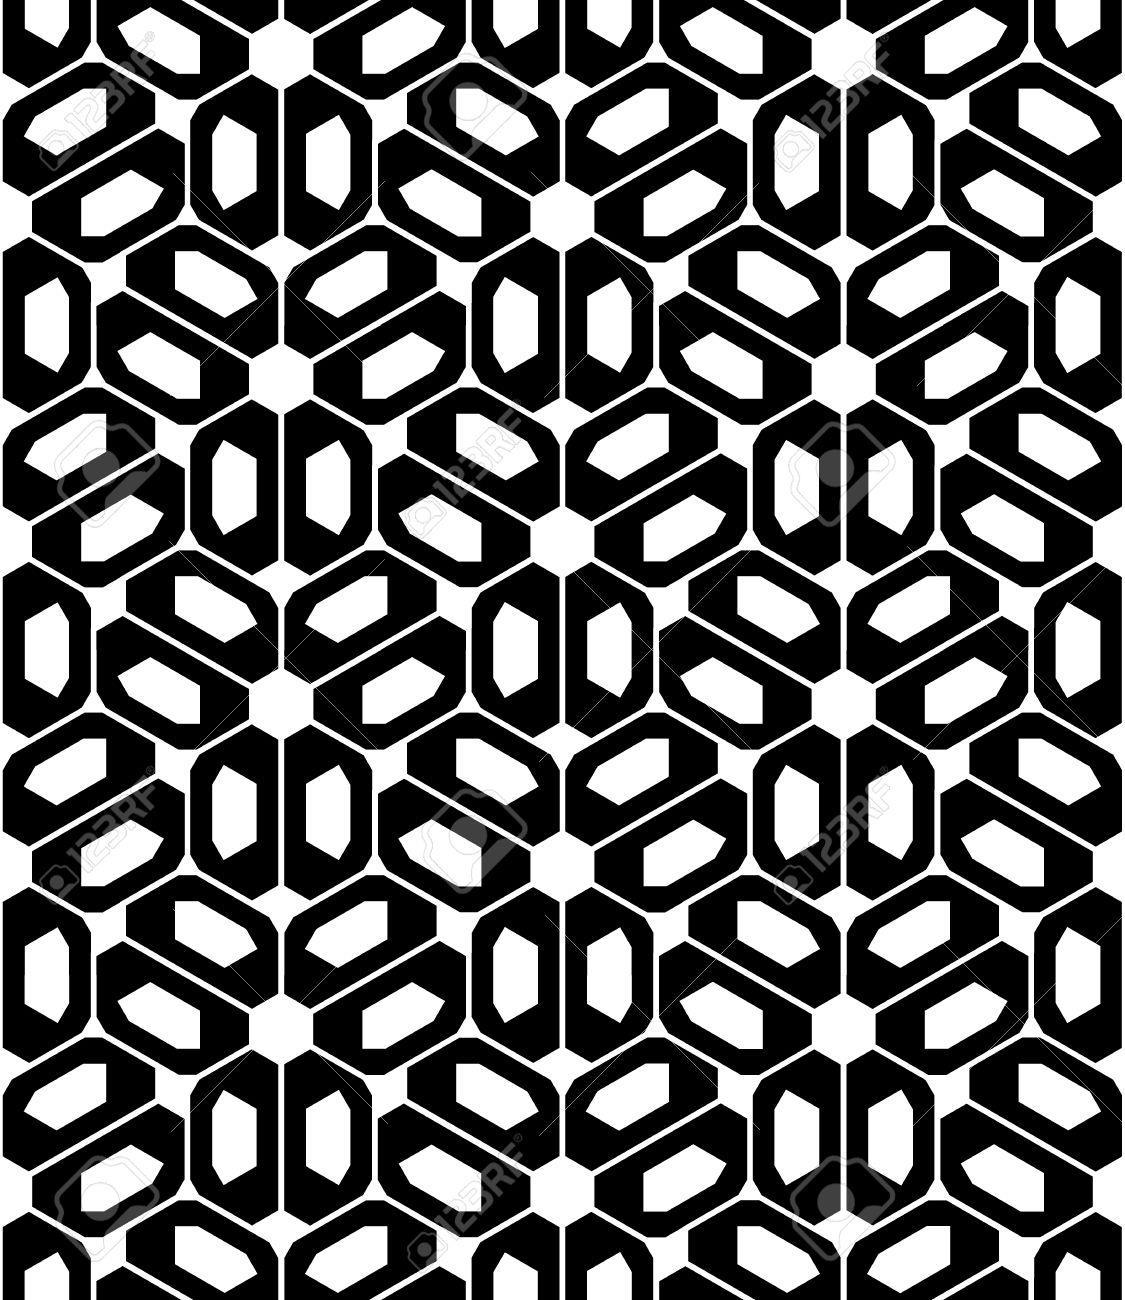 Trippy Background Patterns Black